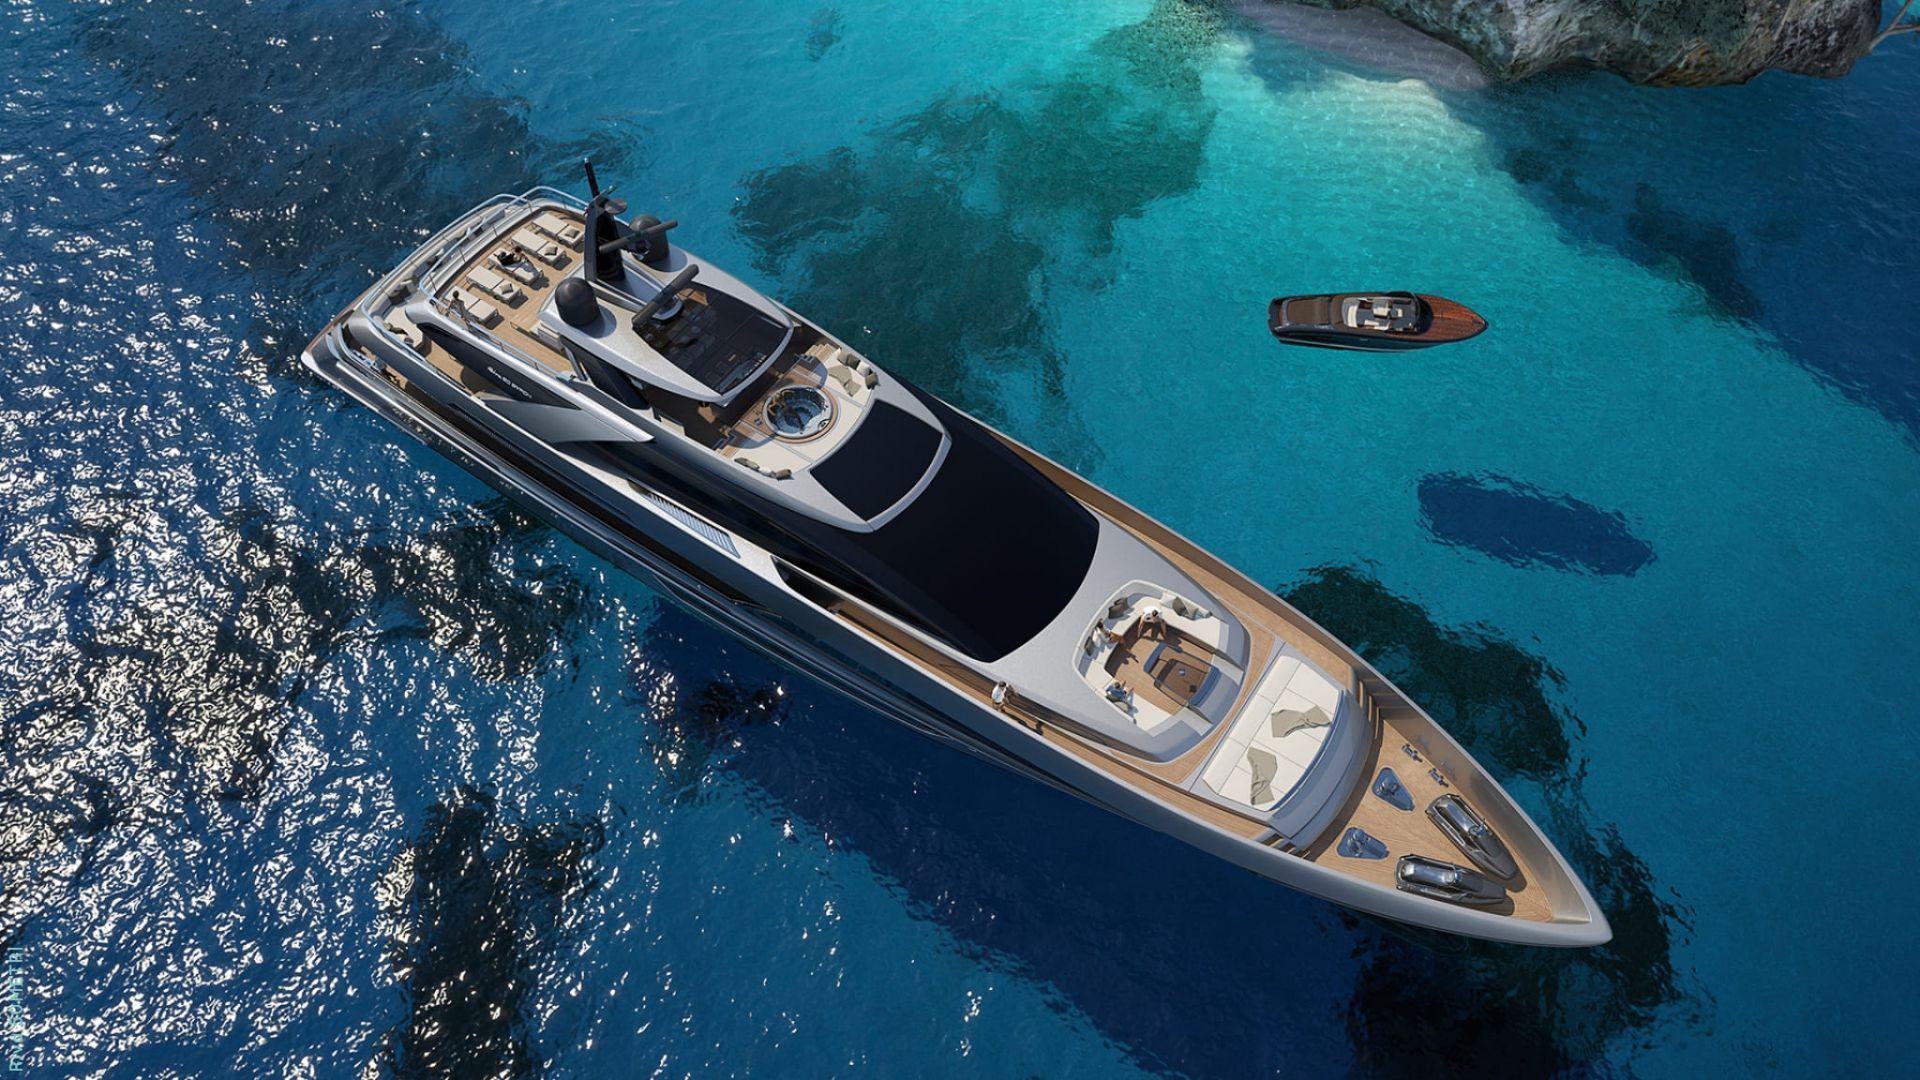 The true luxury of sailing